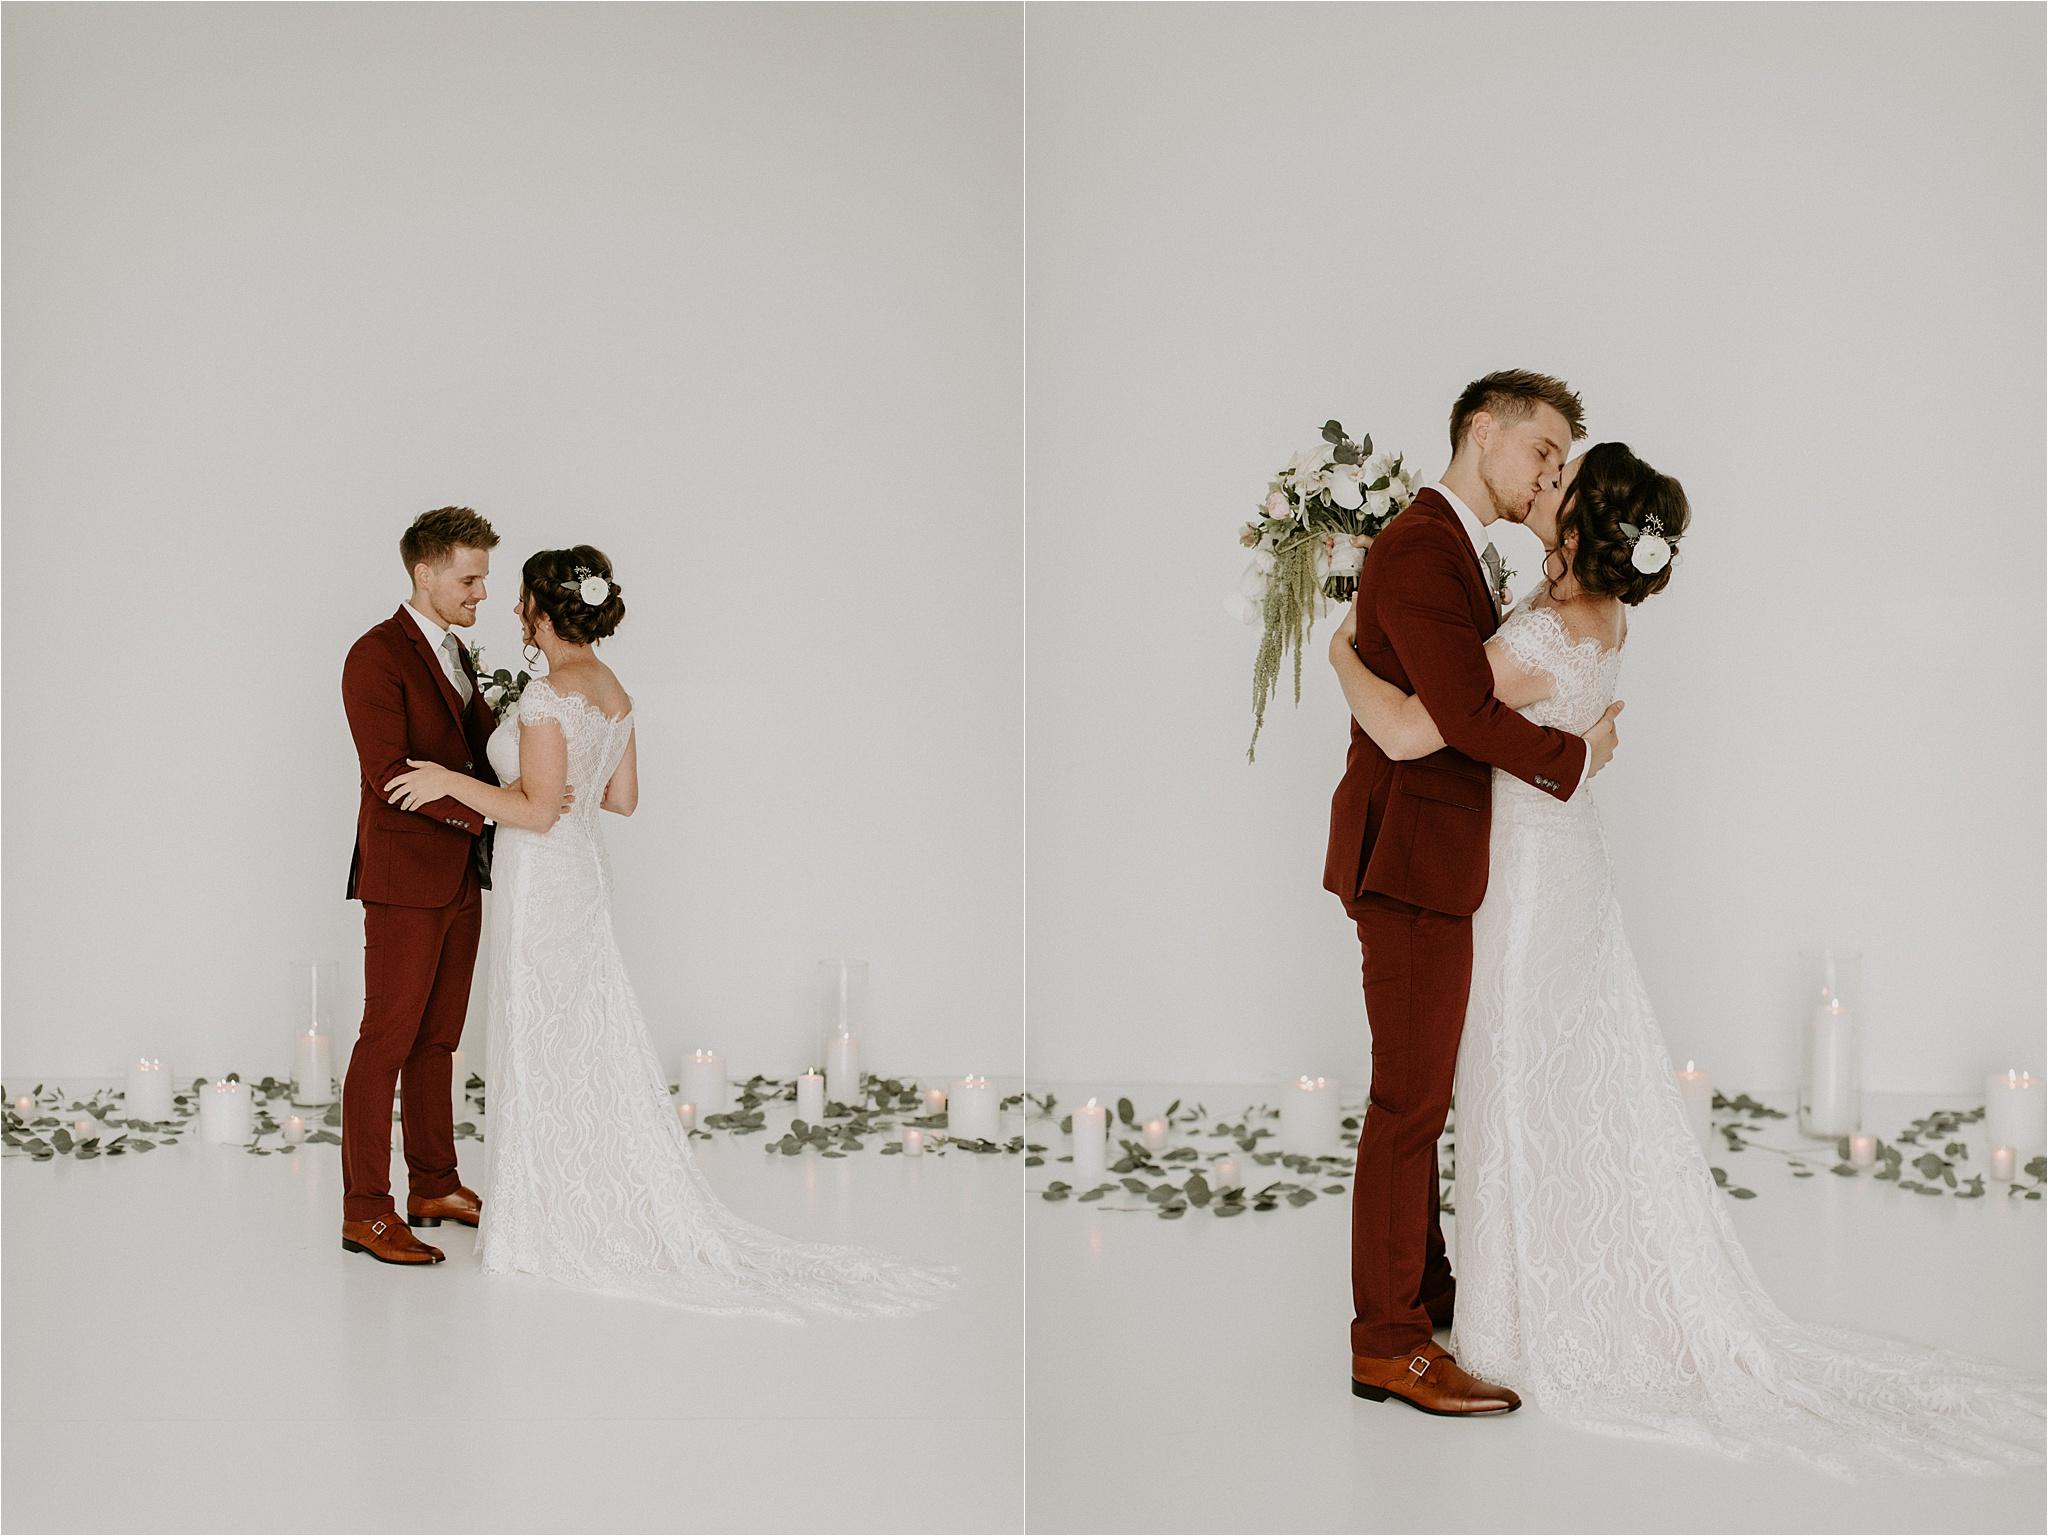 Renee_+_Dustin_-_Supply_Wedding-_0049.jpg